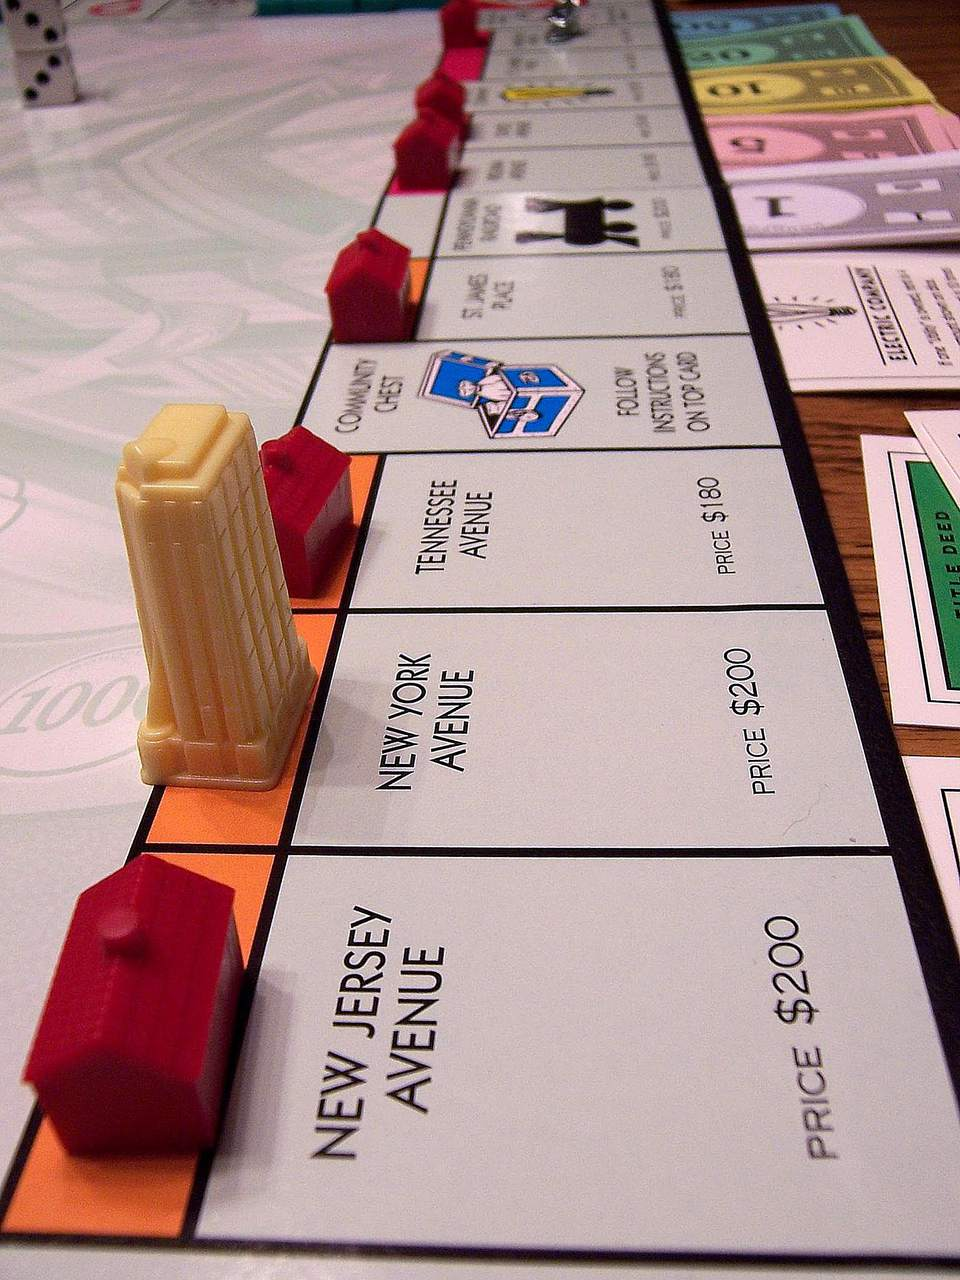 mega monopoly has skyscrapers